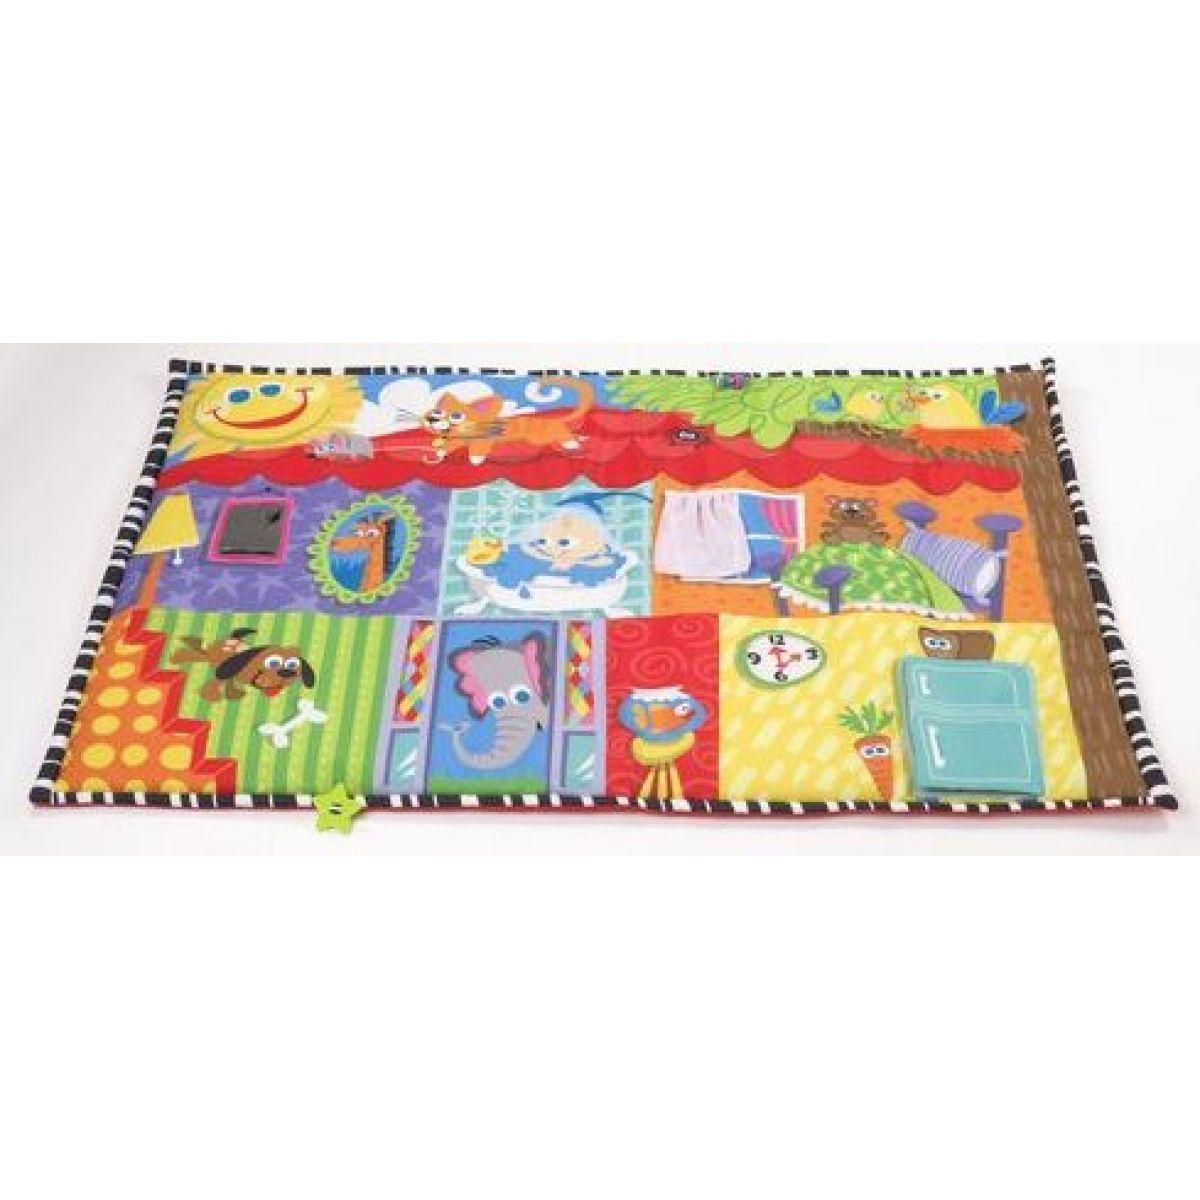 Playgro Velká hrací deka 150x100 cm